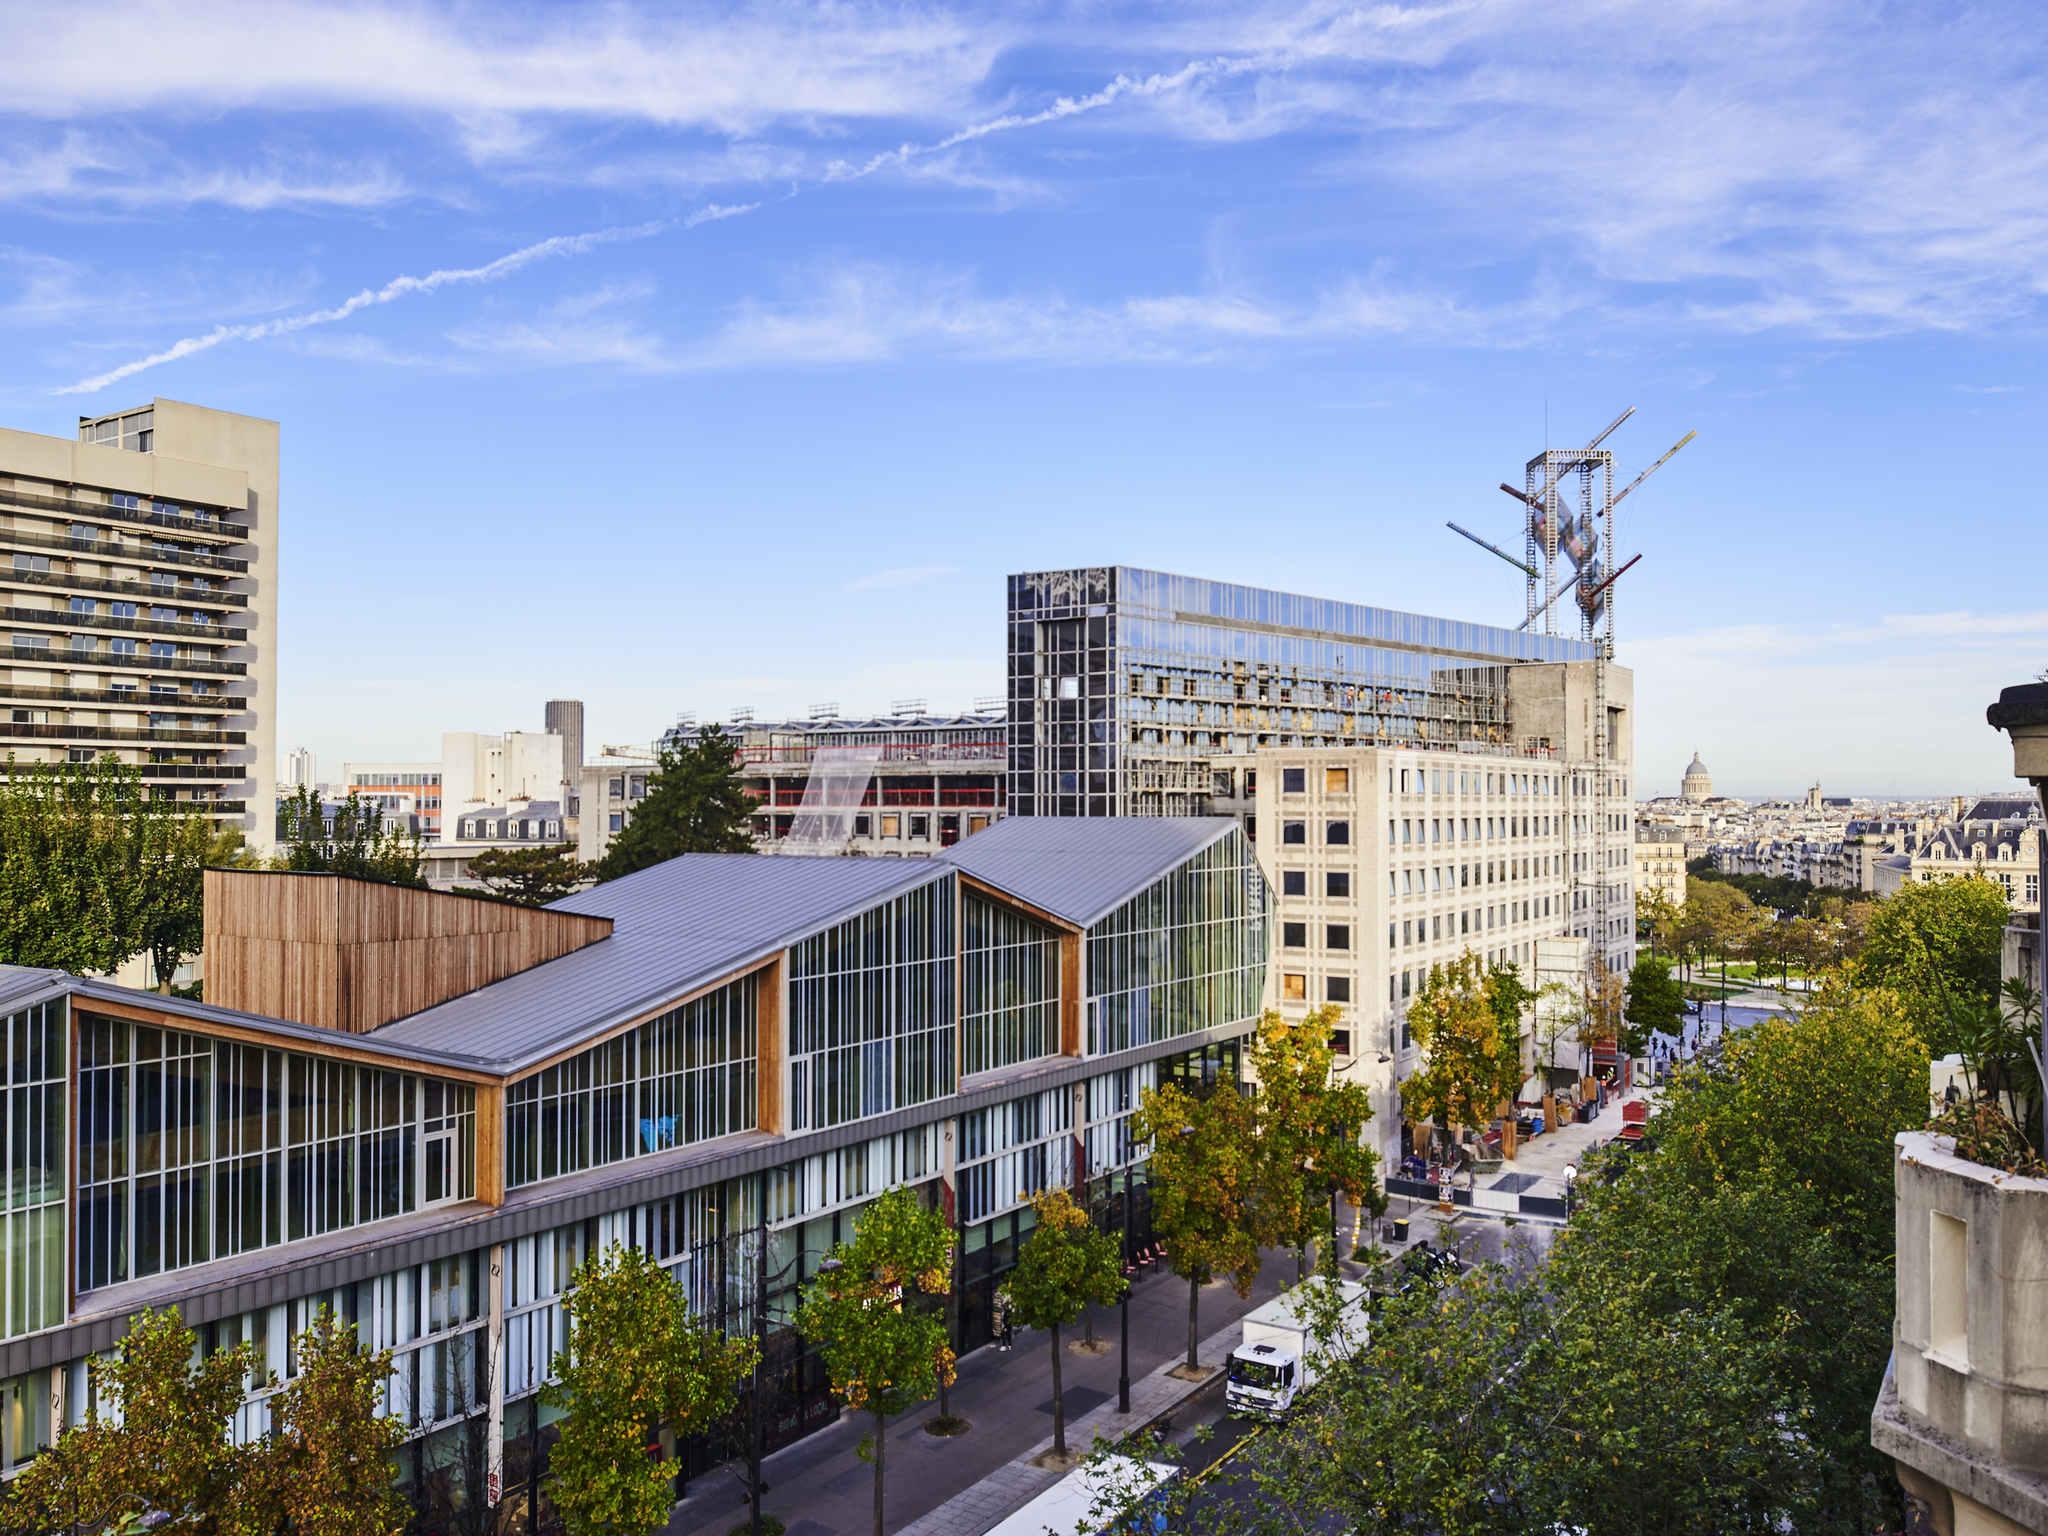 H tel paris ibis paris avenue d 39 italie 13 me - Piscine place d italie ...